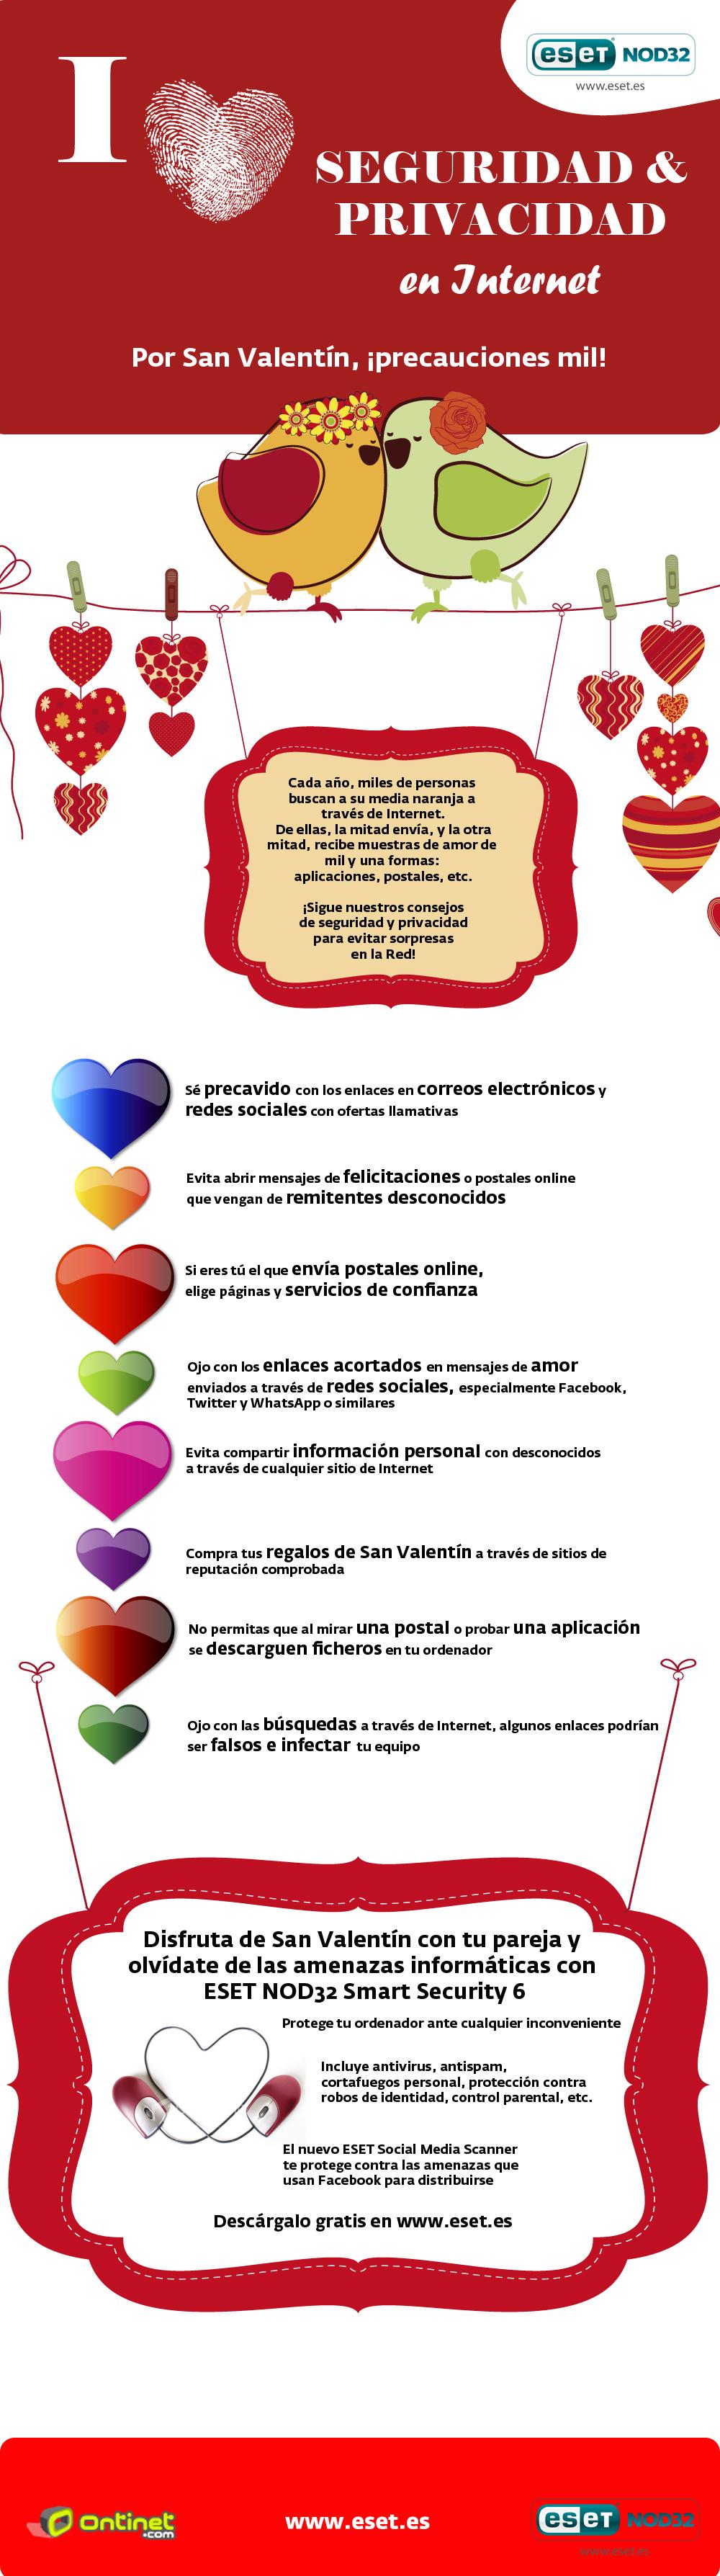 eset_nod32_antivirus_seguridad_informatica_consejos_san_valentin